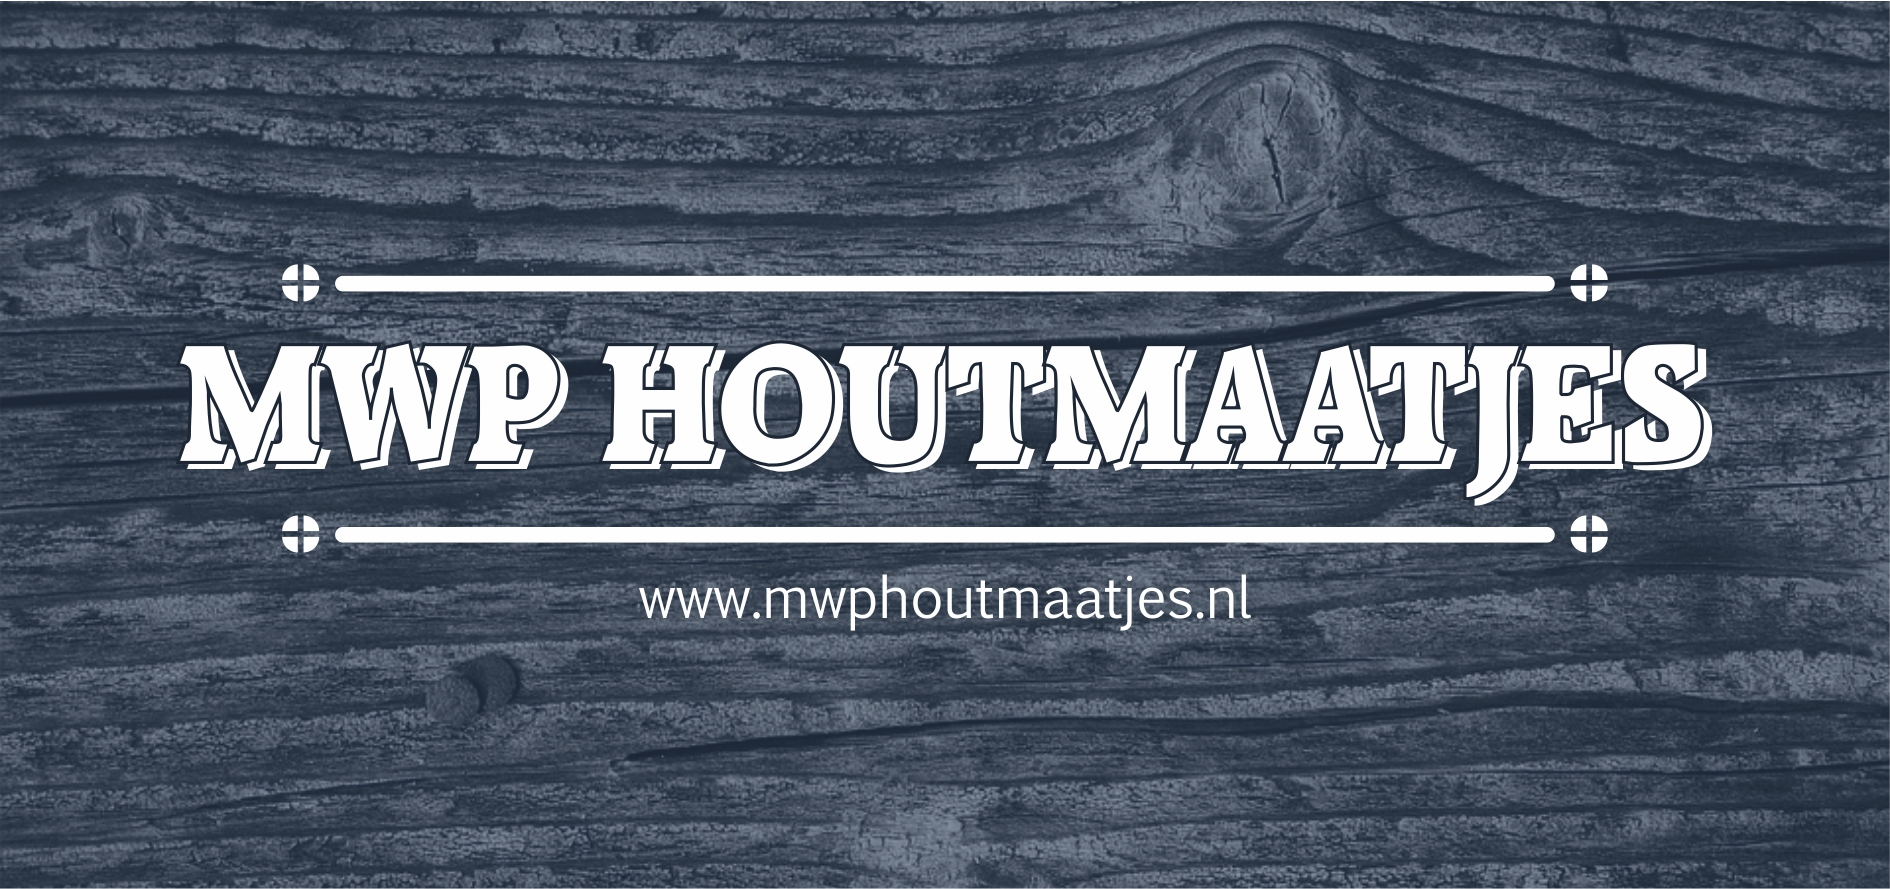 MWP Houtmaatjes